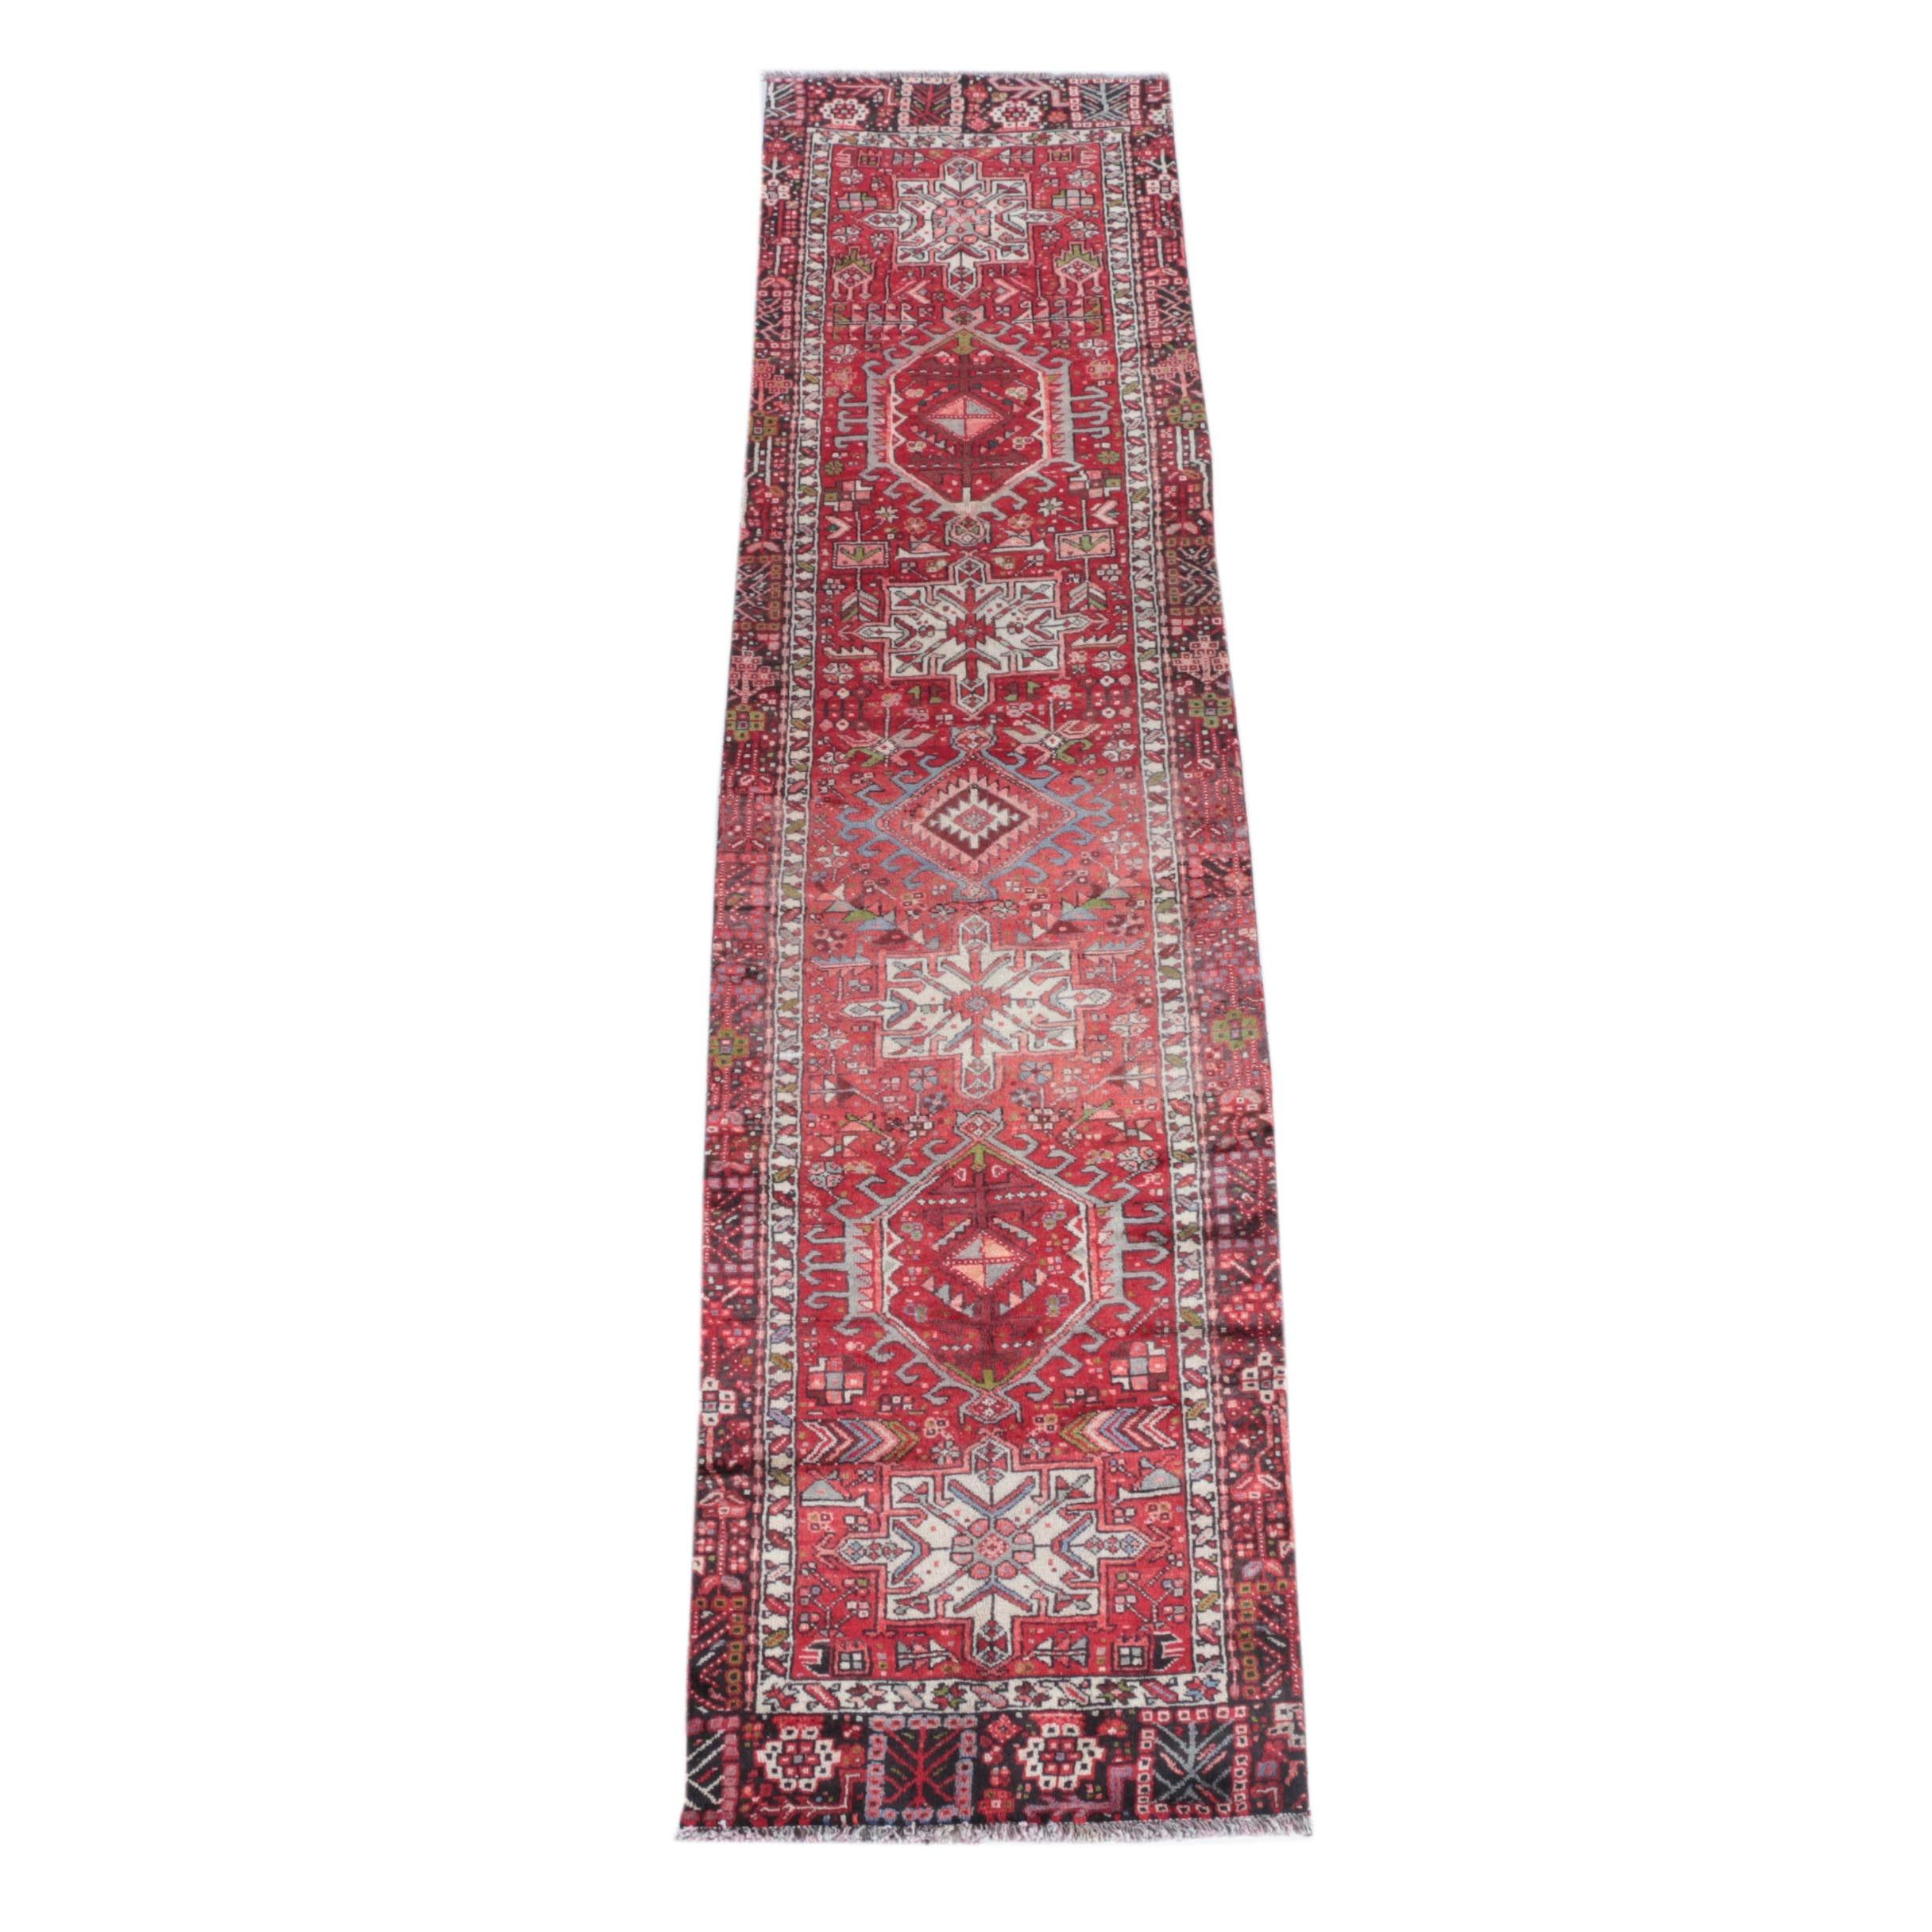 Vintage Hand-Knotted Persian Karaja Wool Carpet Runner